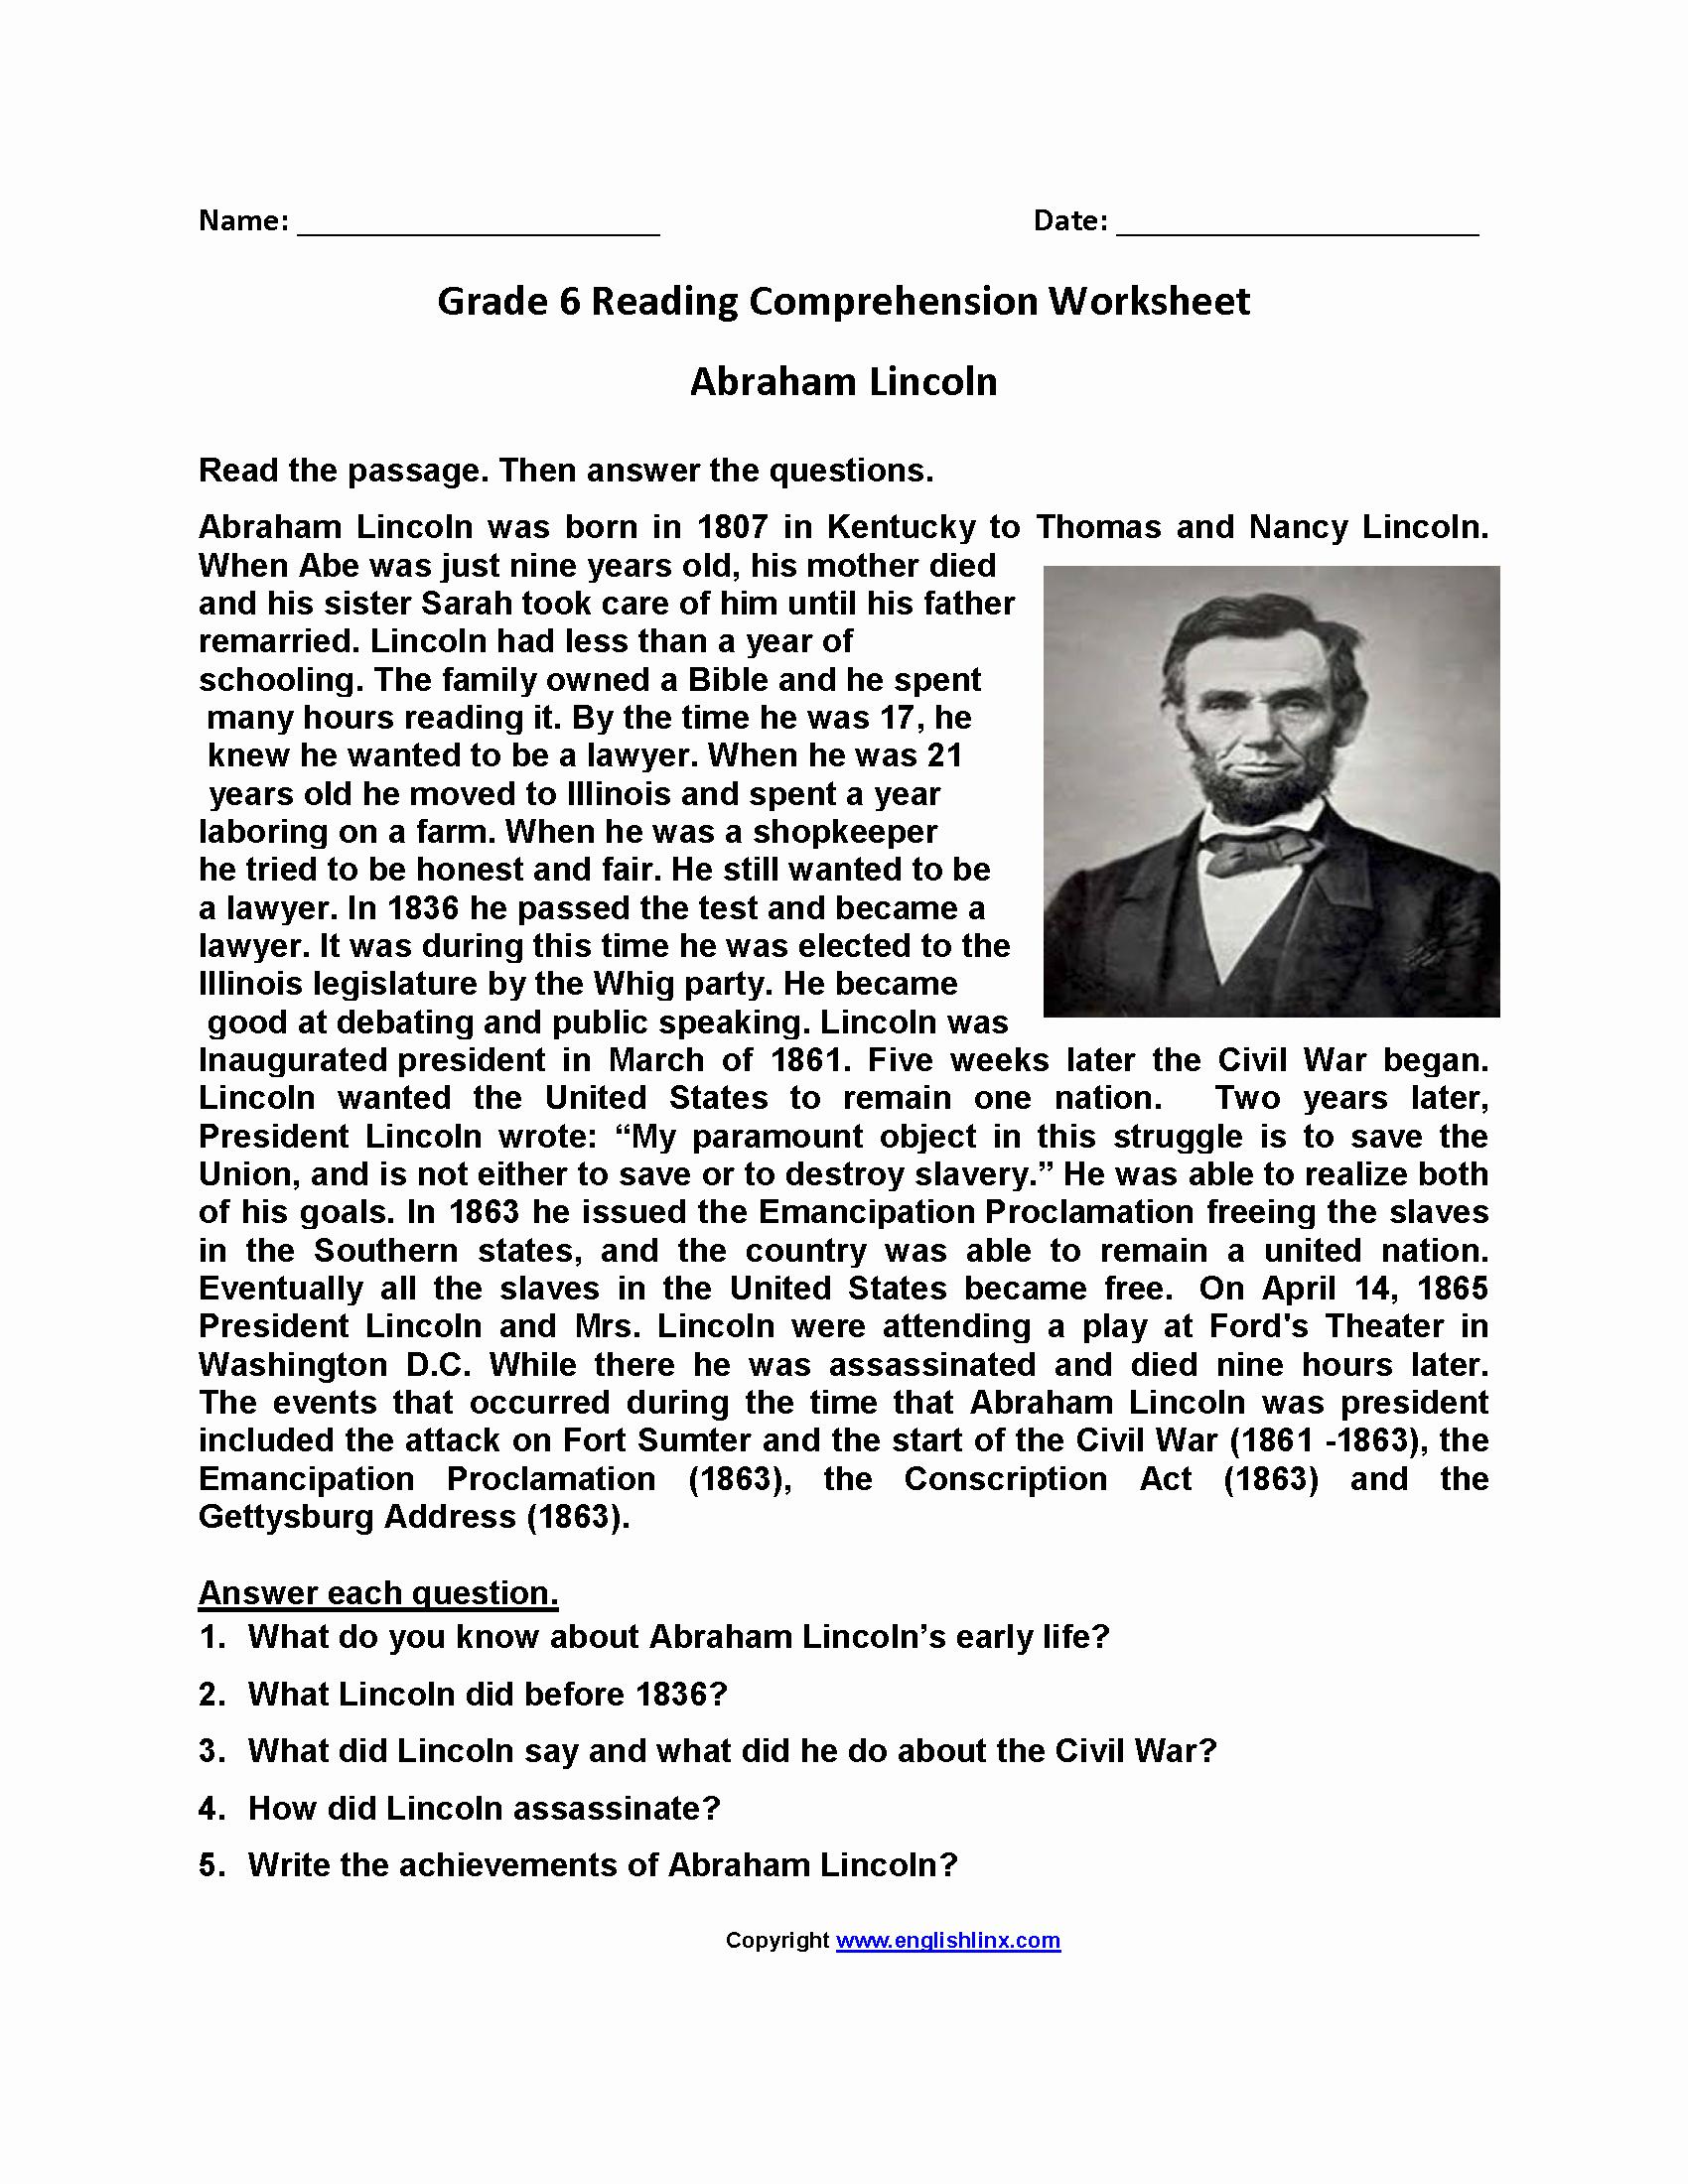 Comprehension Worksheets 6th Grade New 6th Grade Reading Prehension Pdf Multiplyillustration